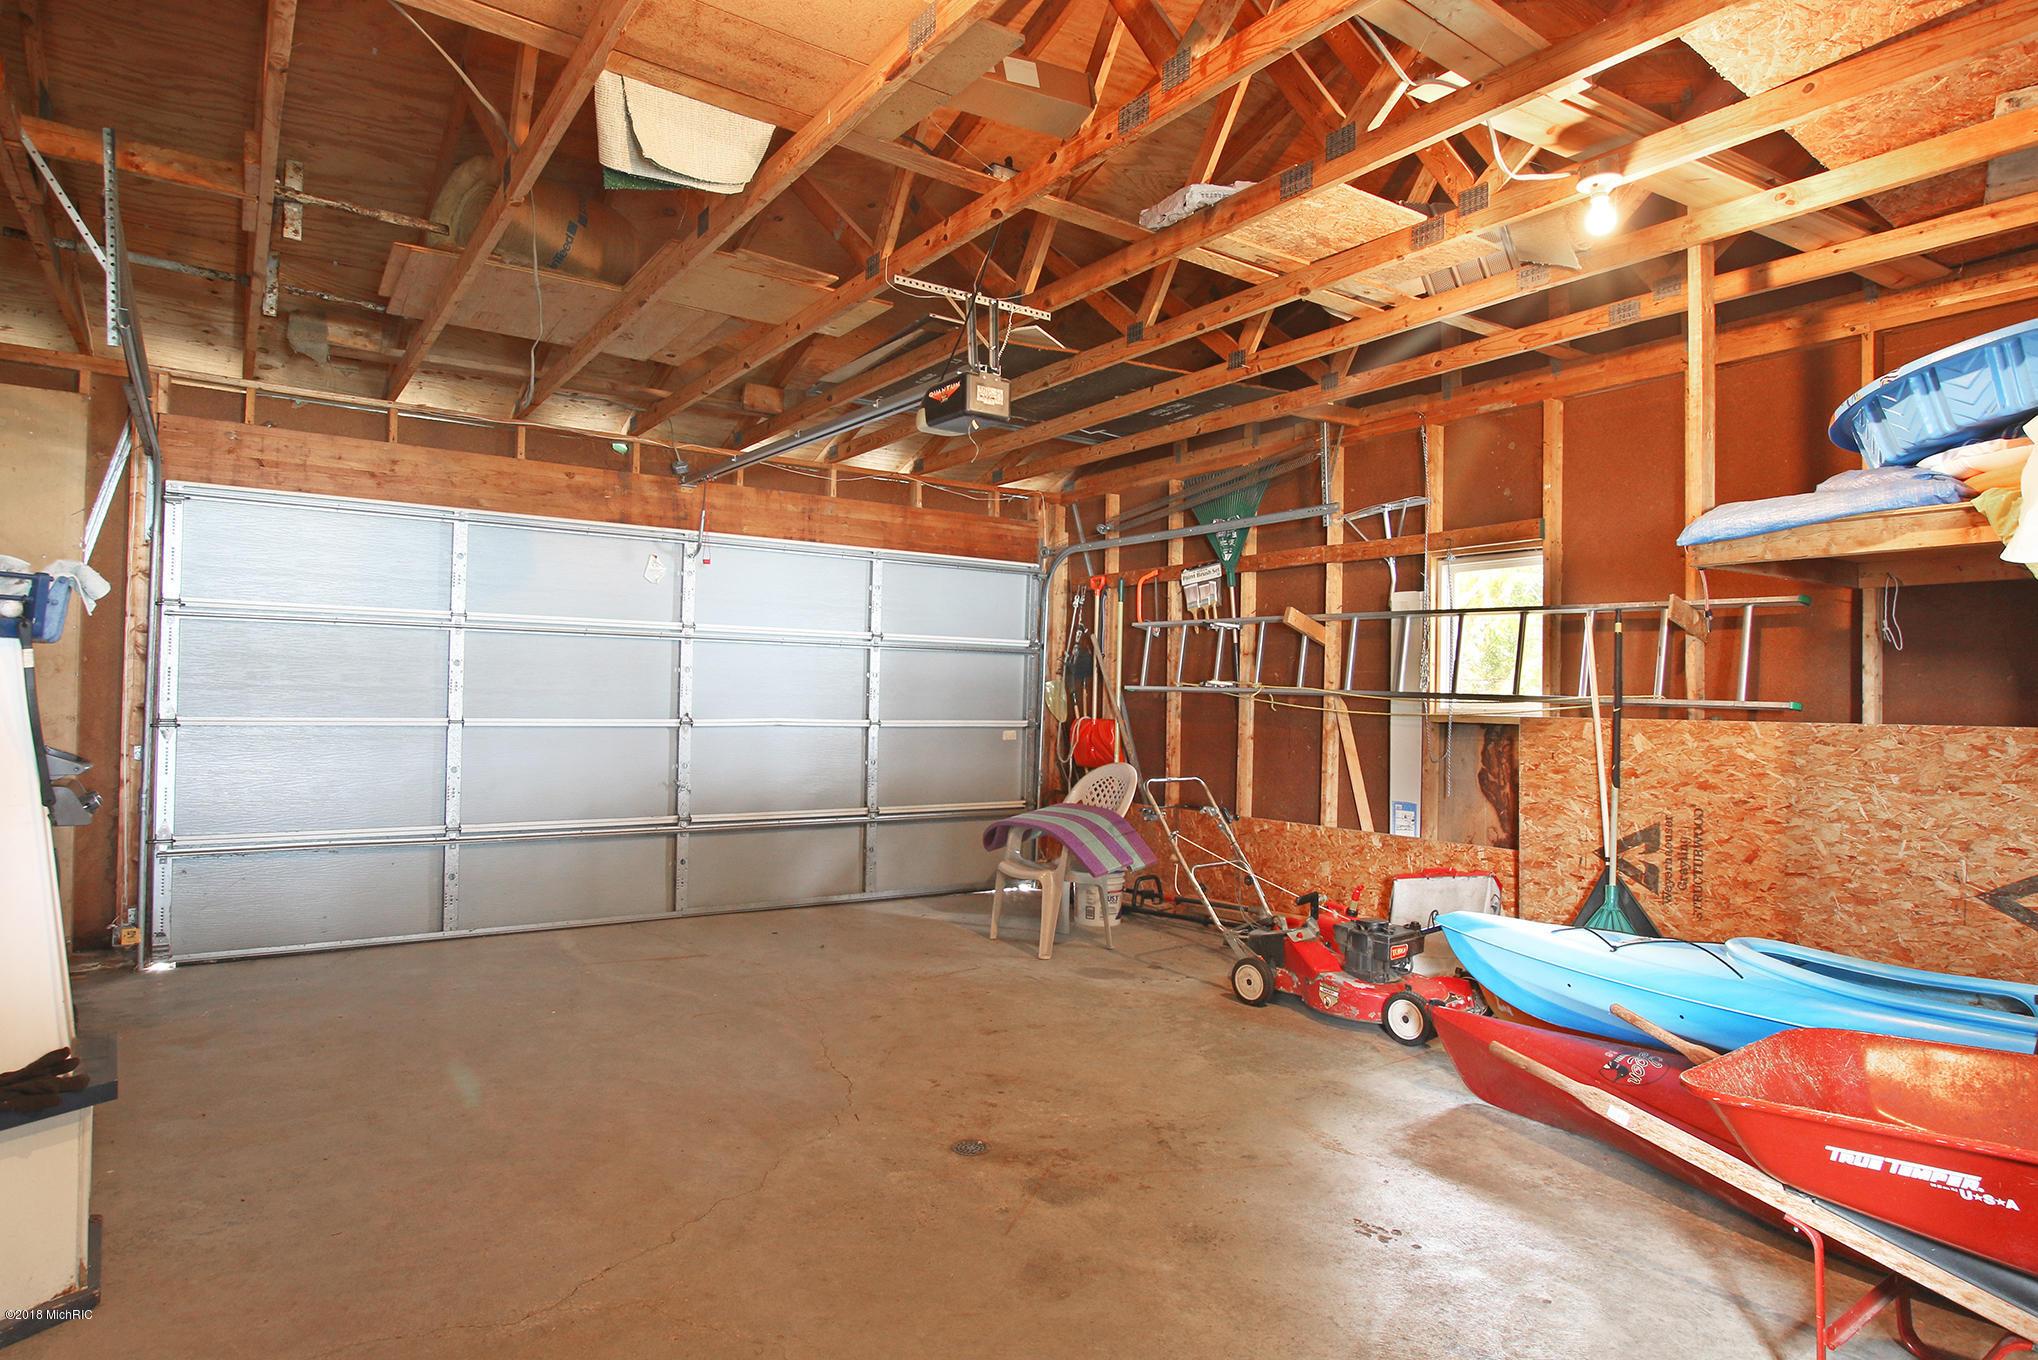 Interior of 2 stall garage